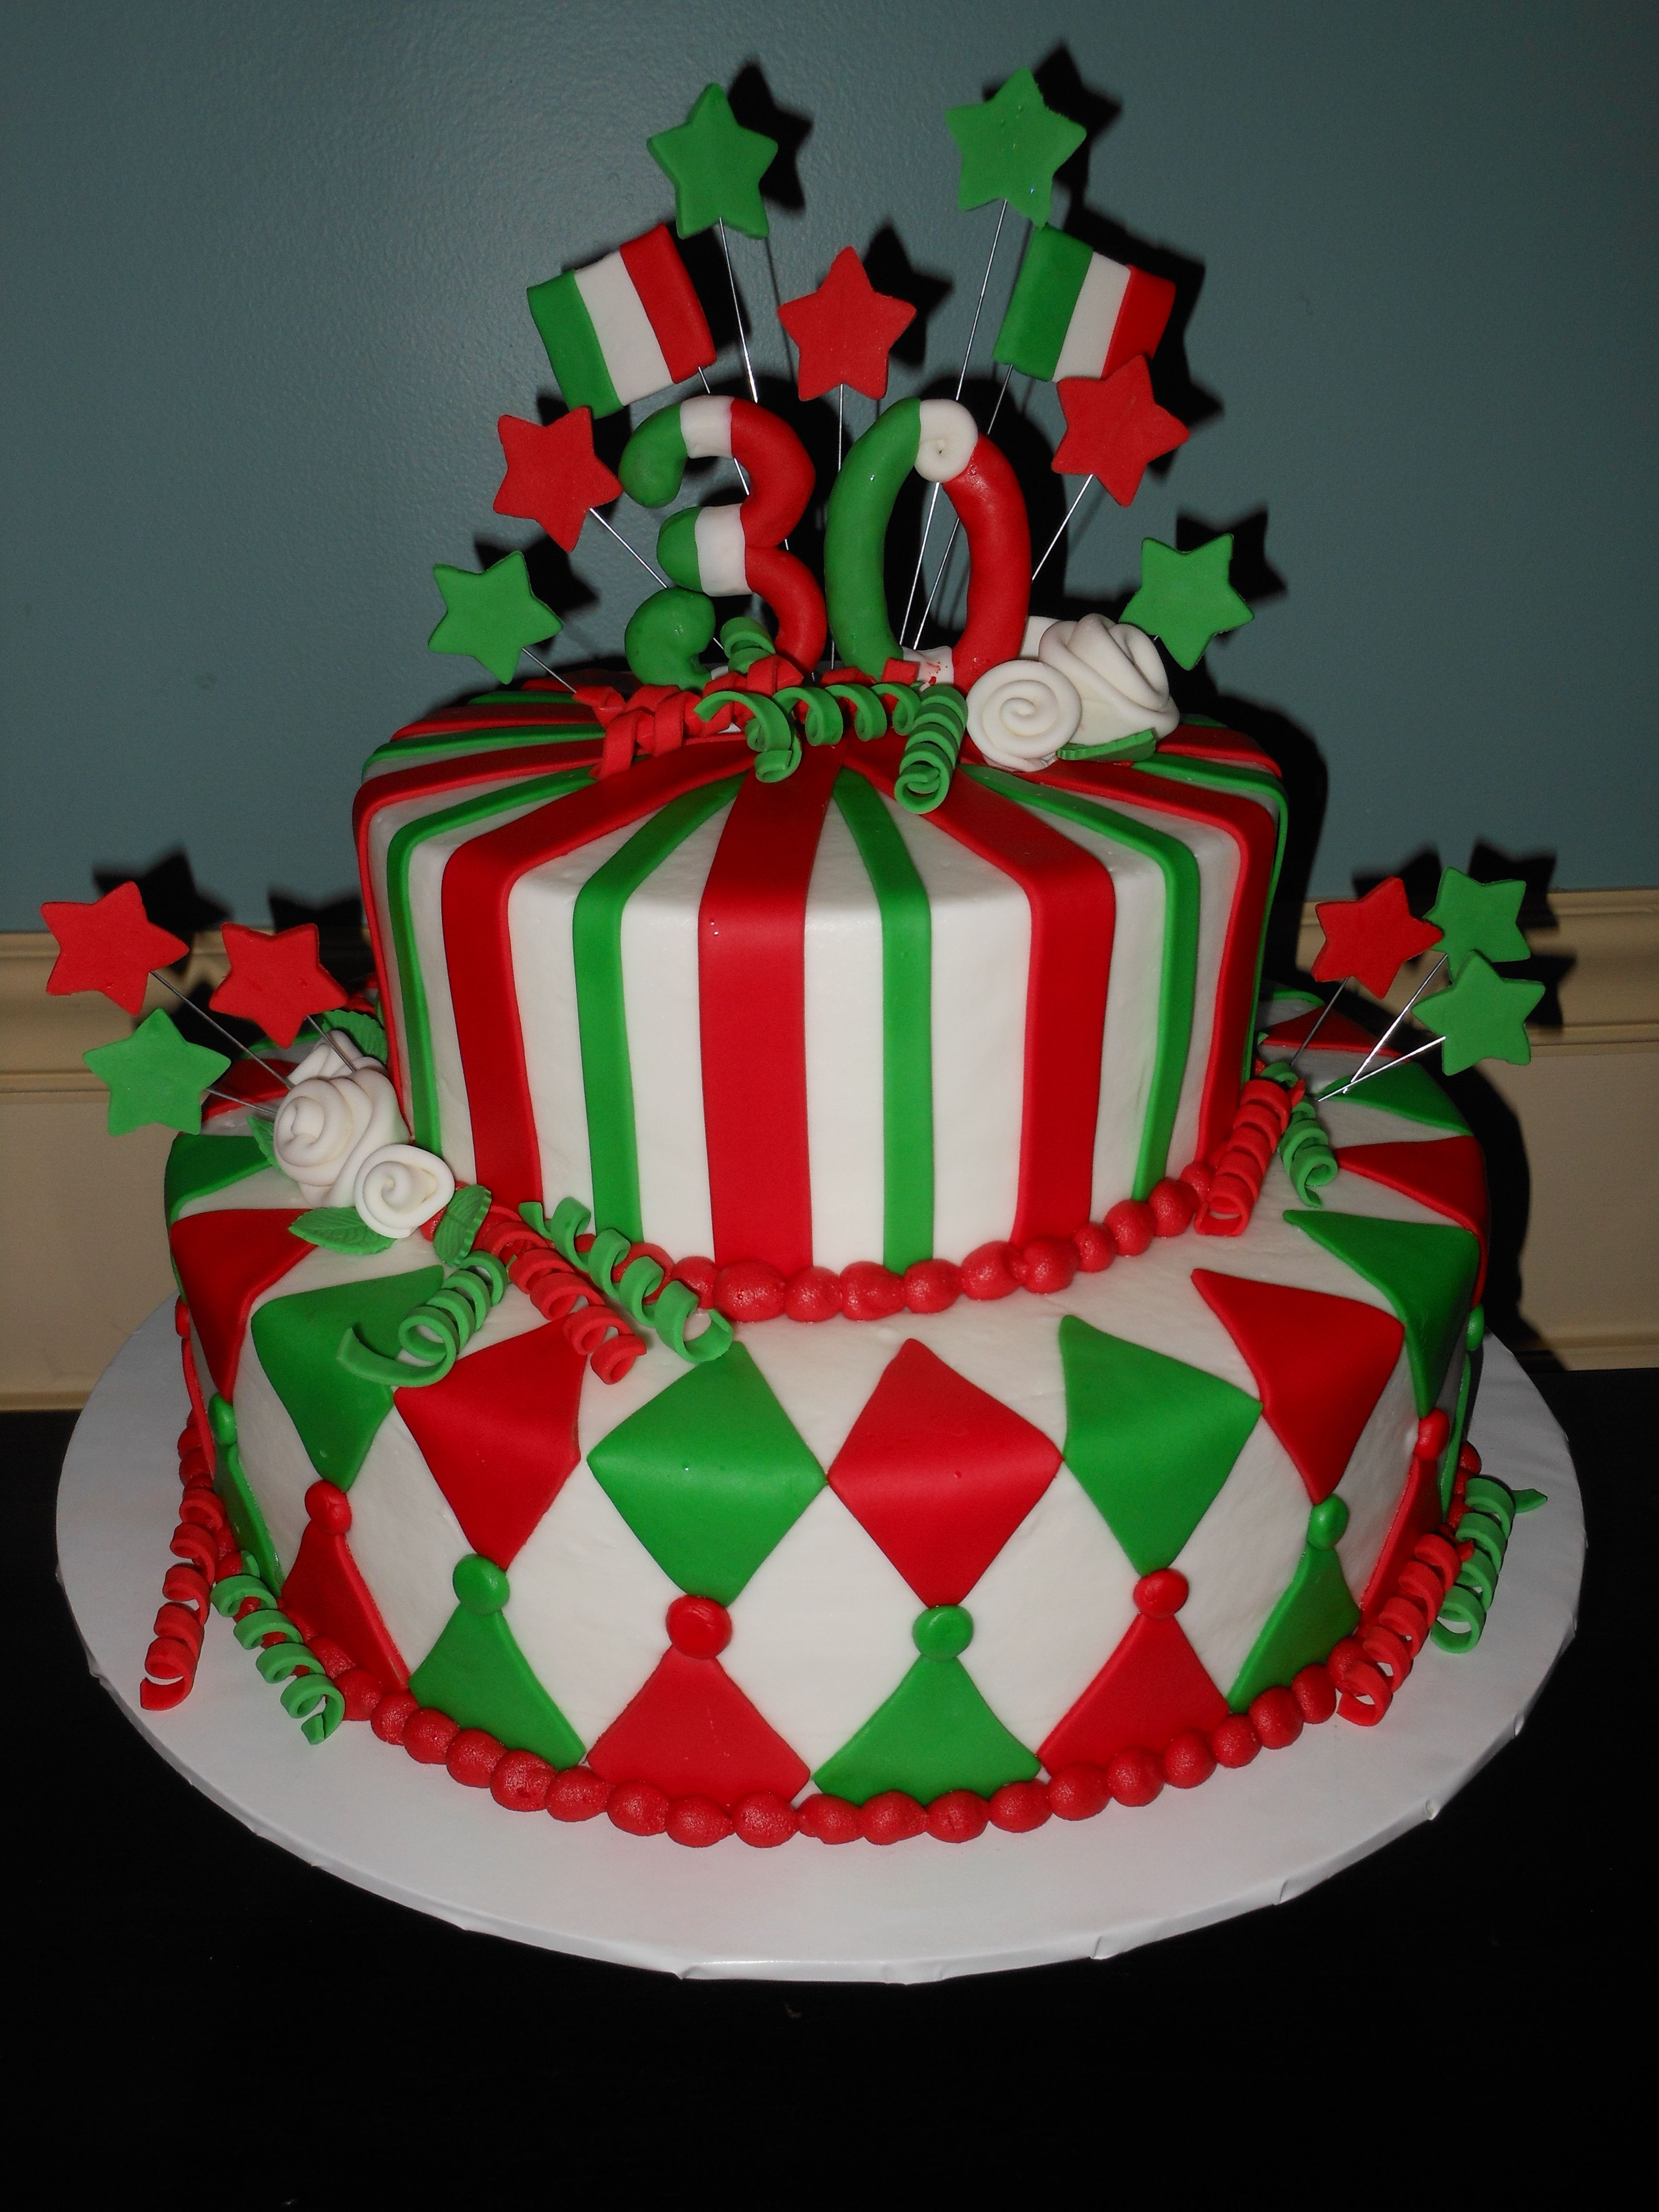 Cake Design Italia Facebook : Italian Flag Cake My Cakes Pinterest Italy ...